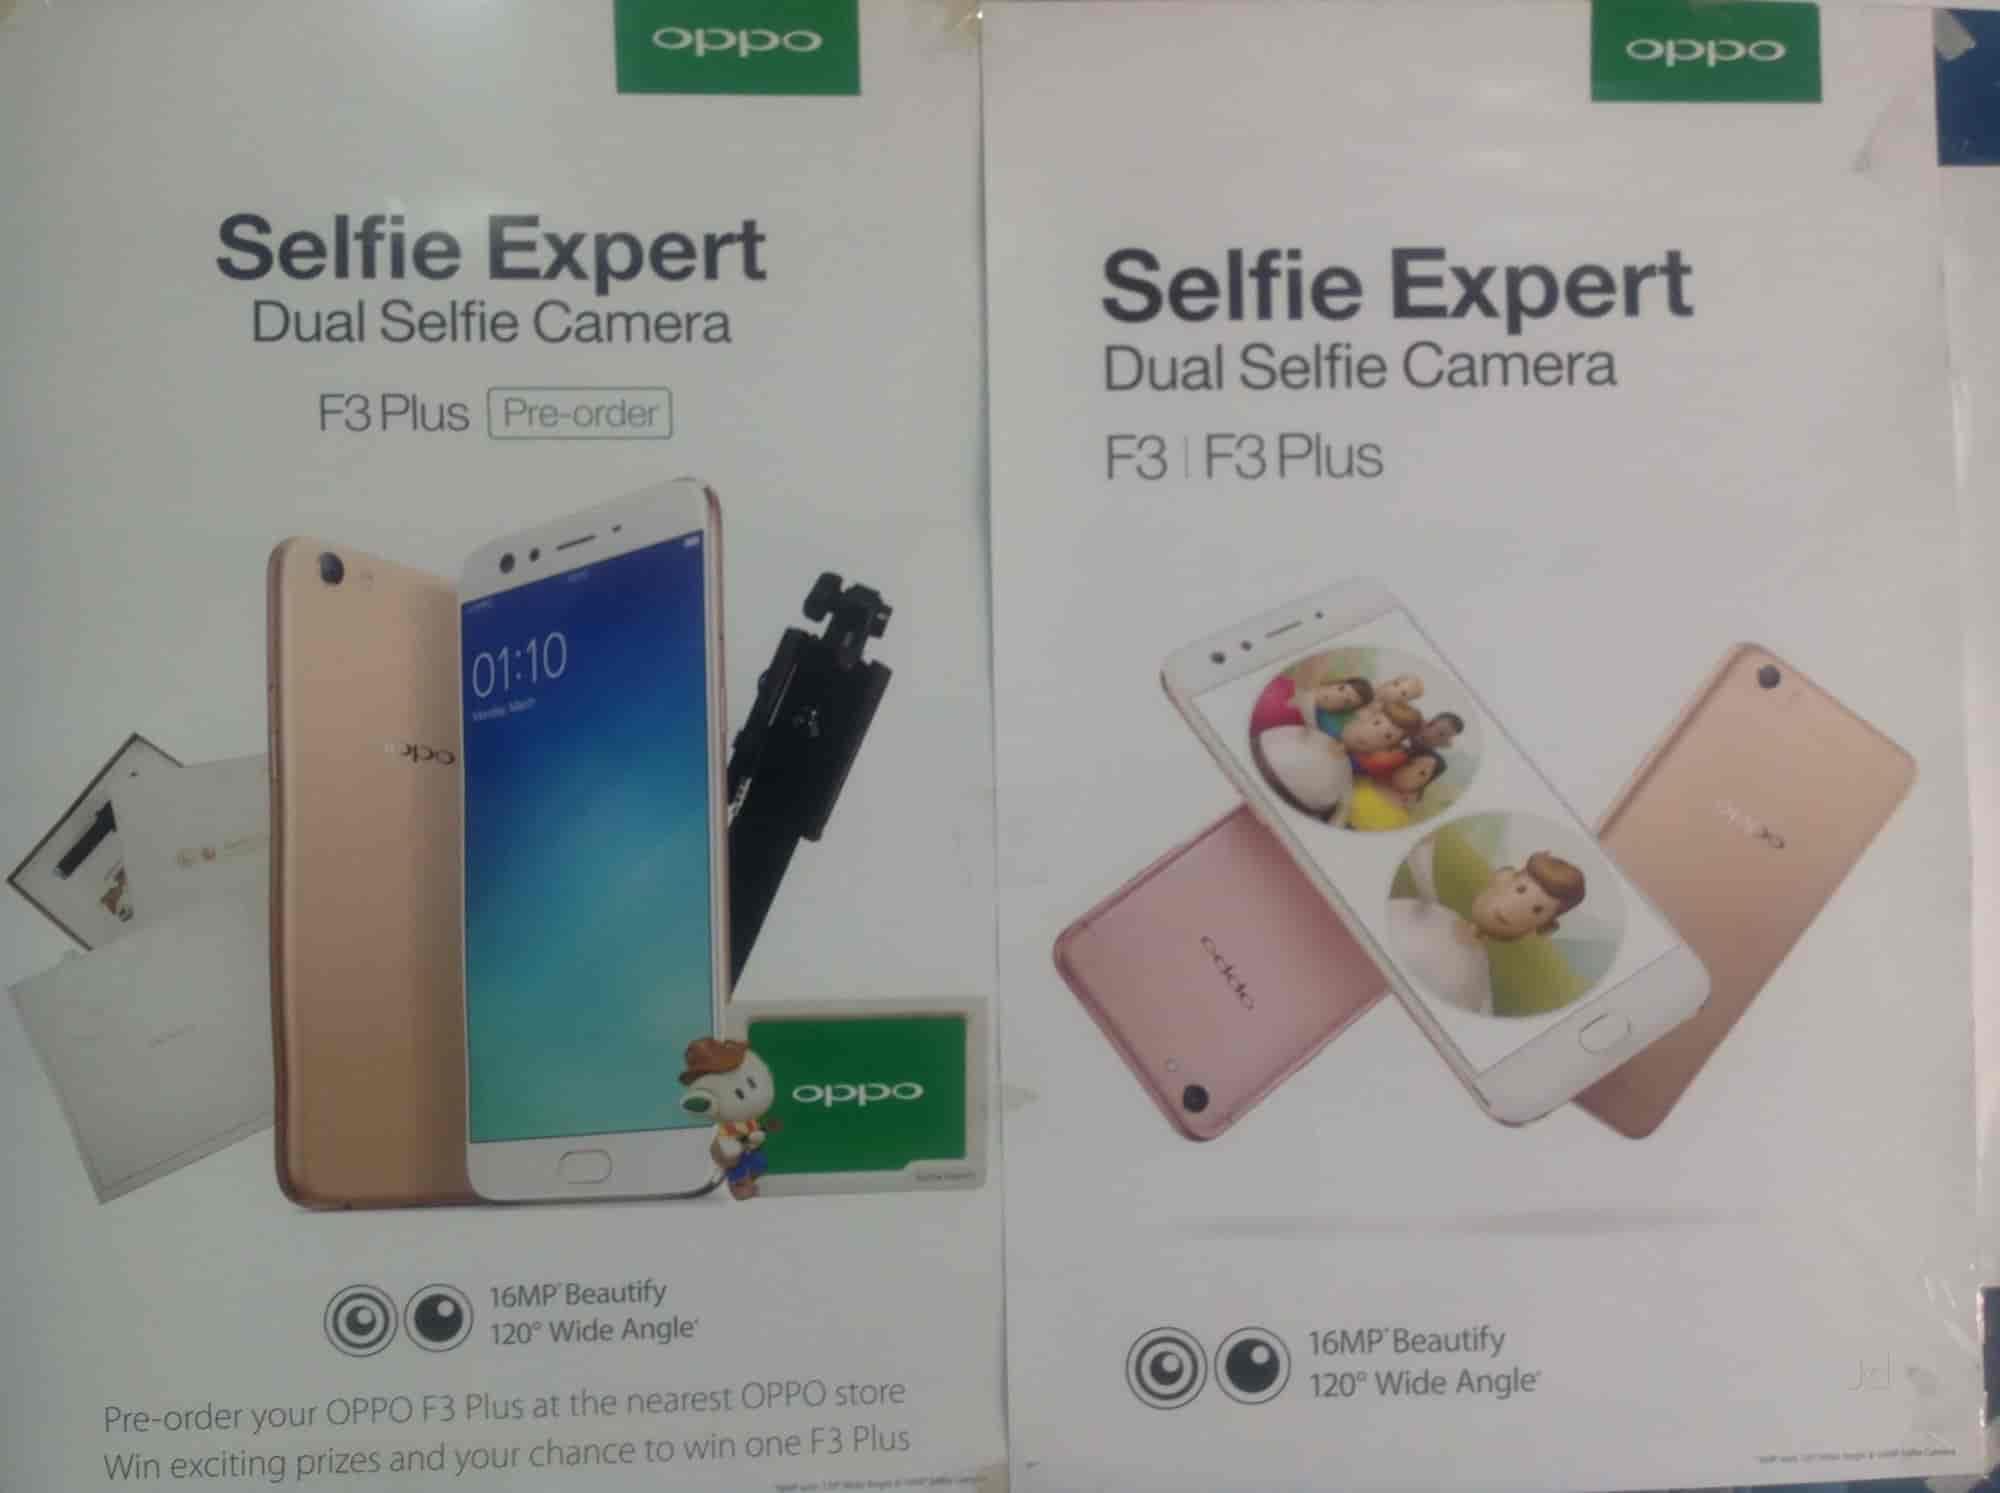 Svl Mobiles Pragathi Nagar Kukatpally Mobile Phone Dealers In Oppo F3 Citra Land Hyderabad Justdial